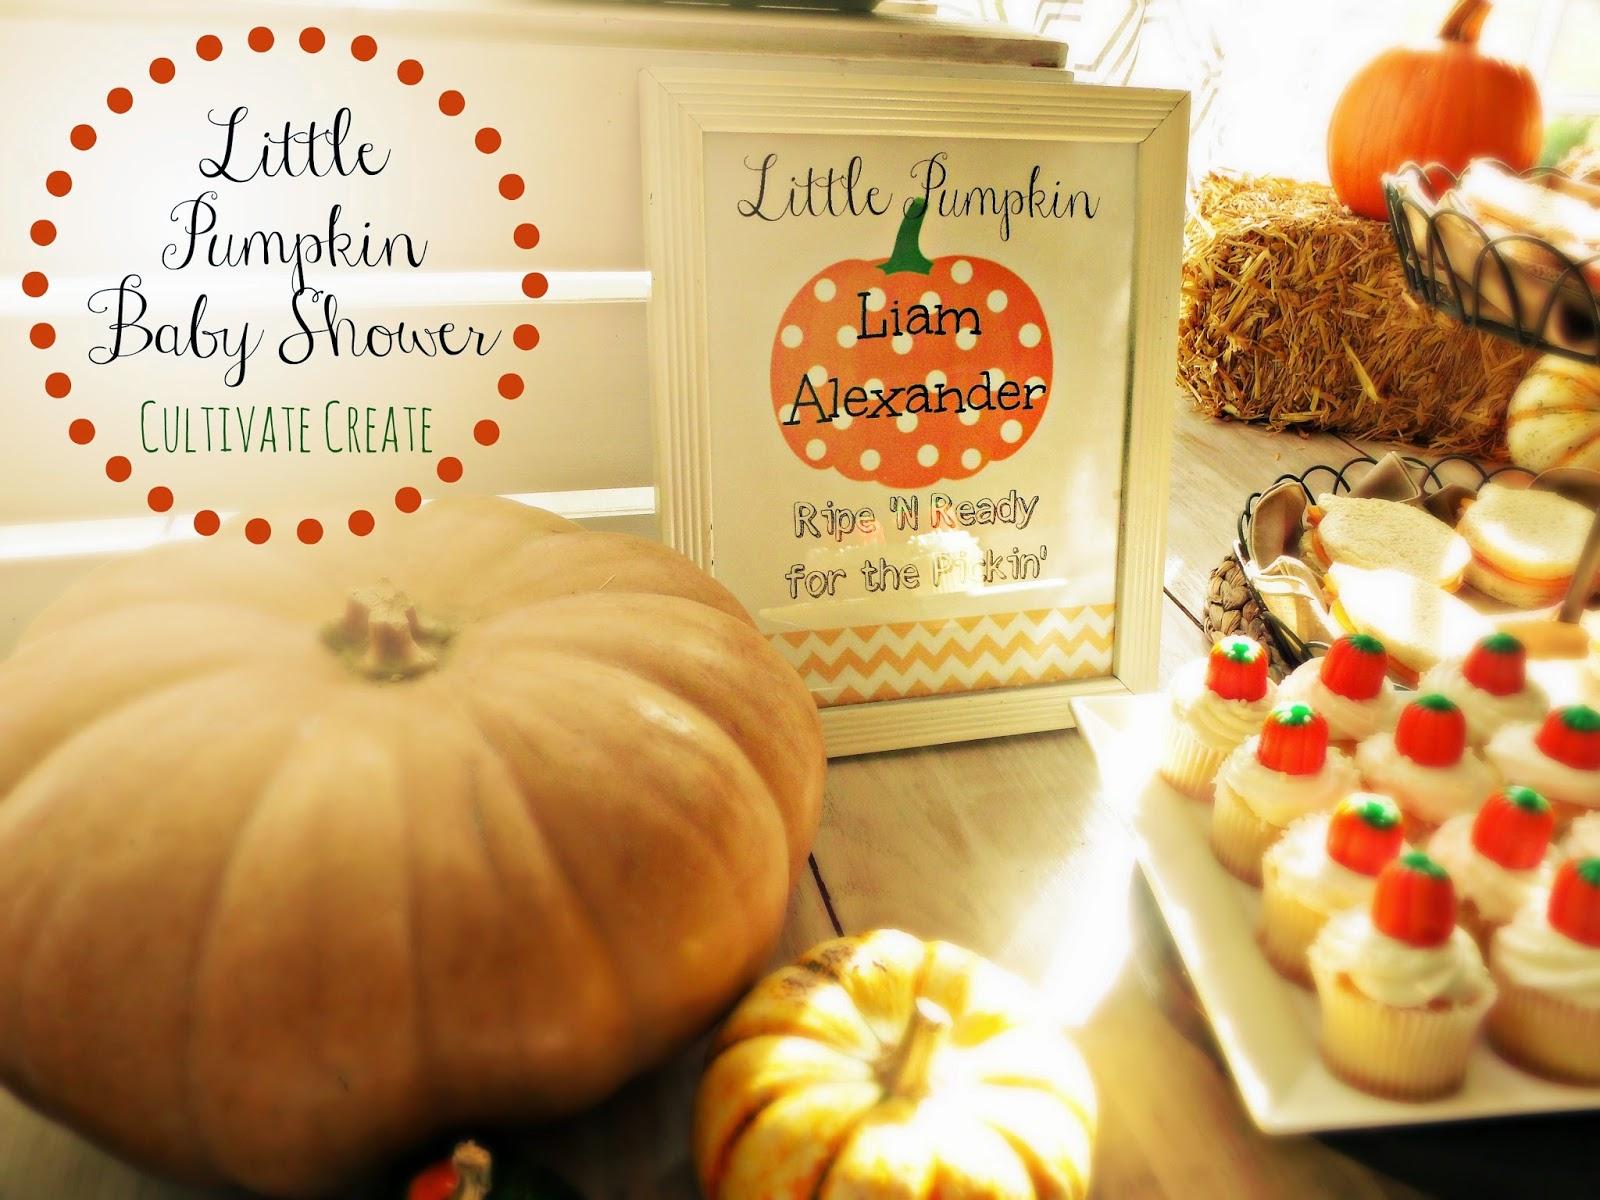 Pumpkin Themed Baby Shower Invitations was nice invitation ideas